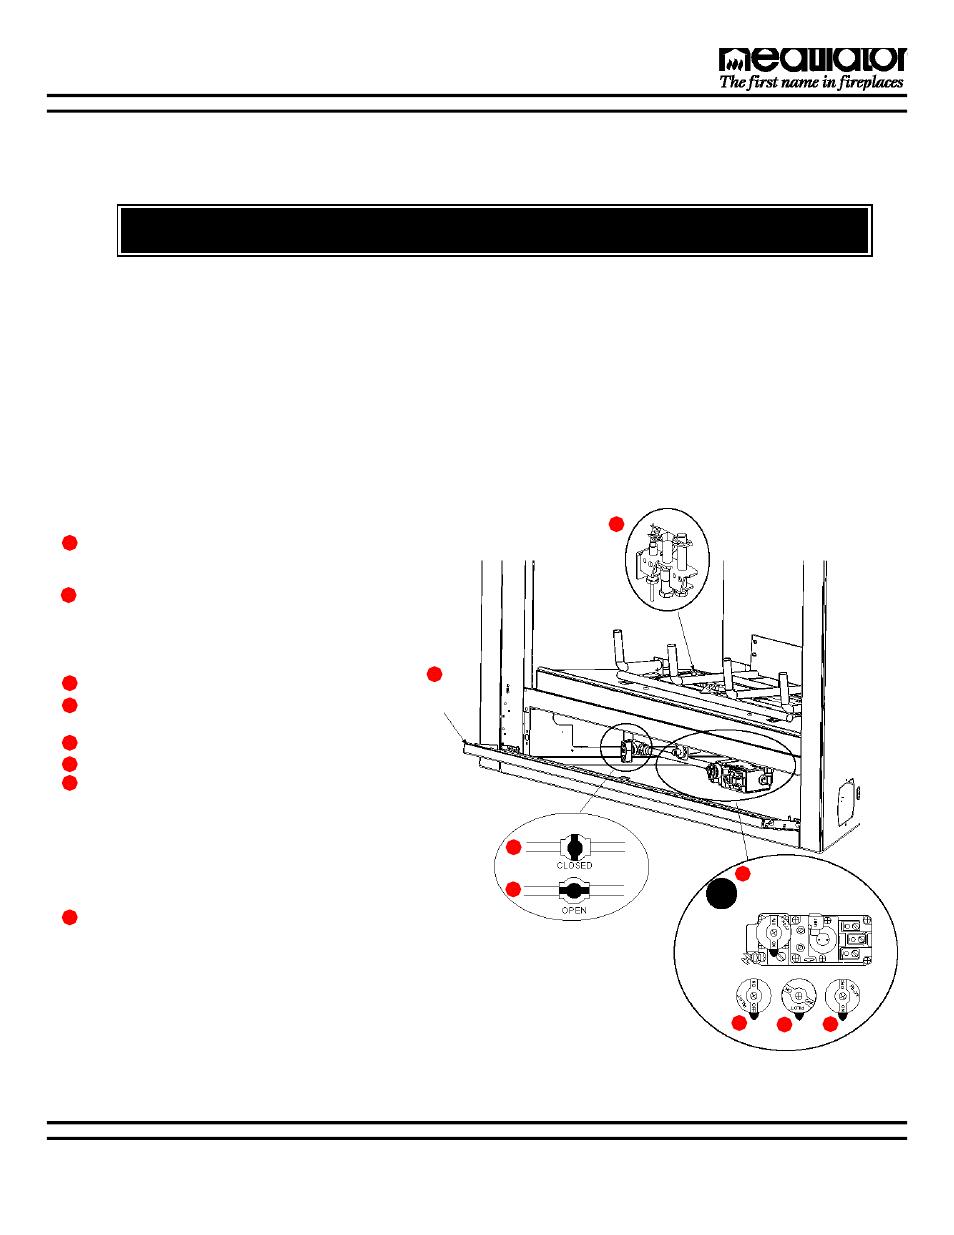 heatilator wiring diagram keh 2600 speaker wiring diagram